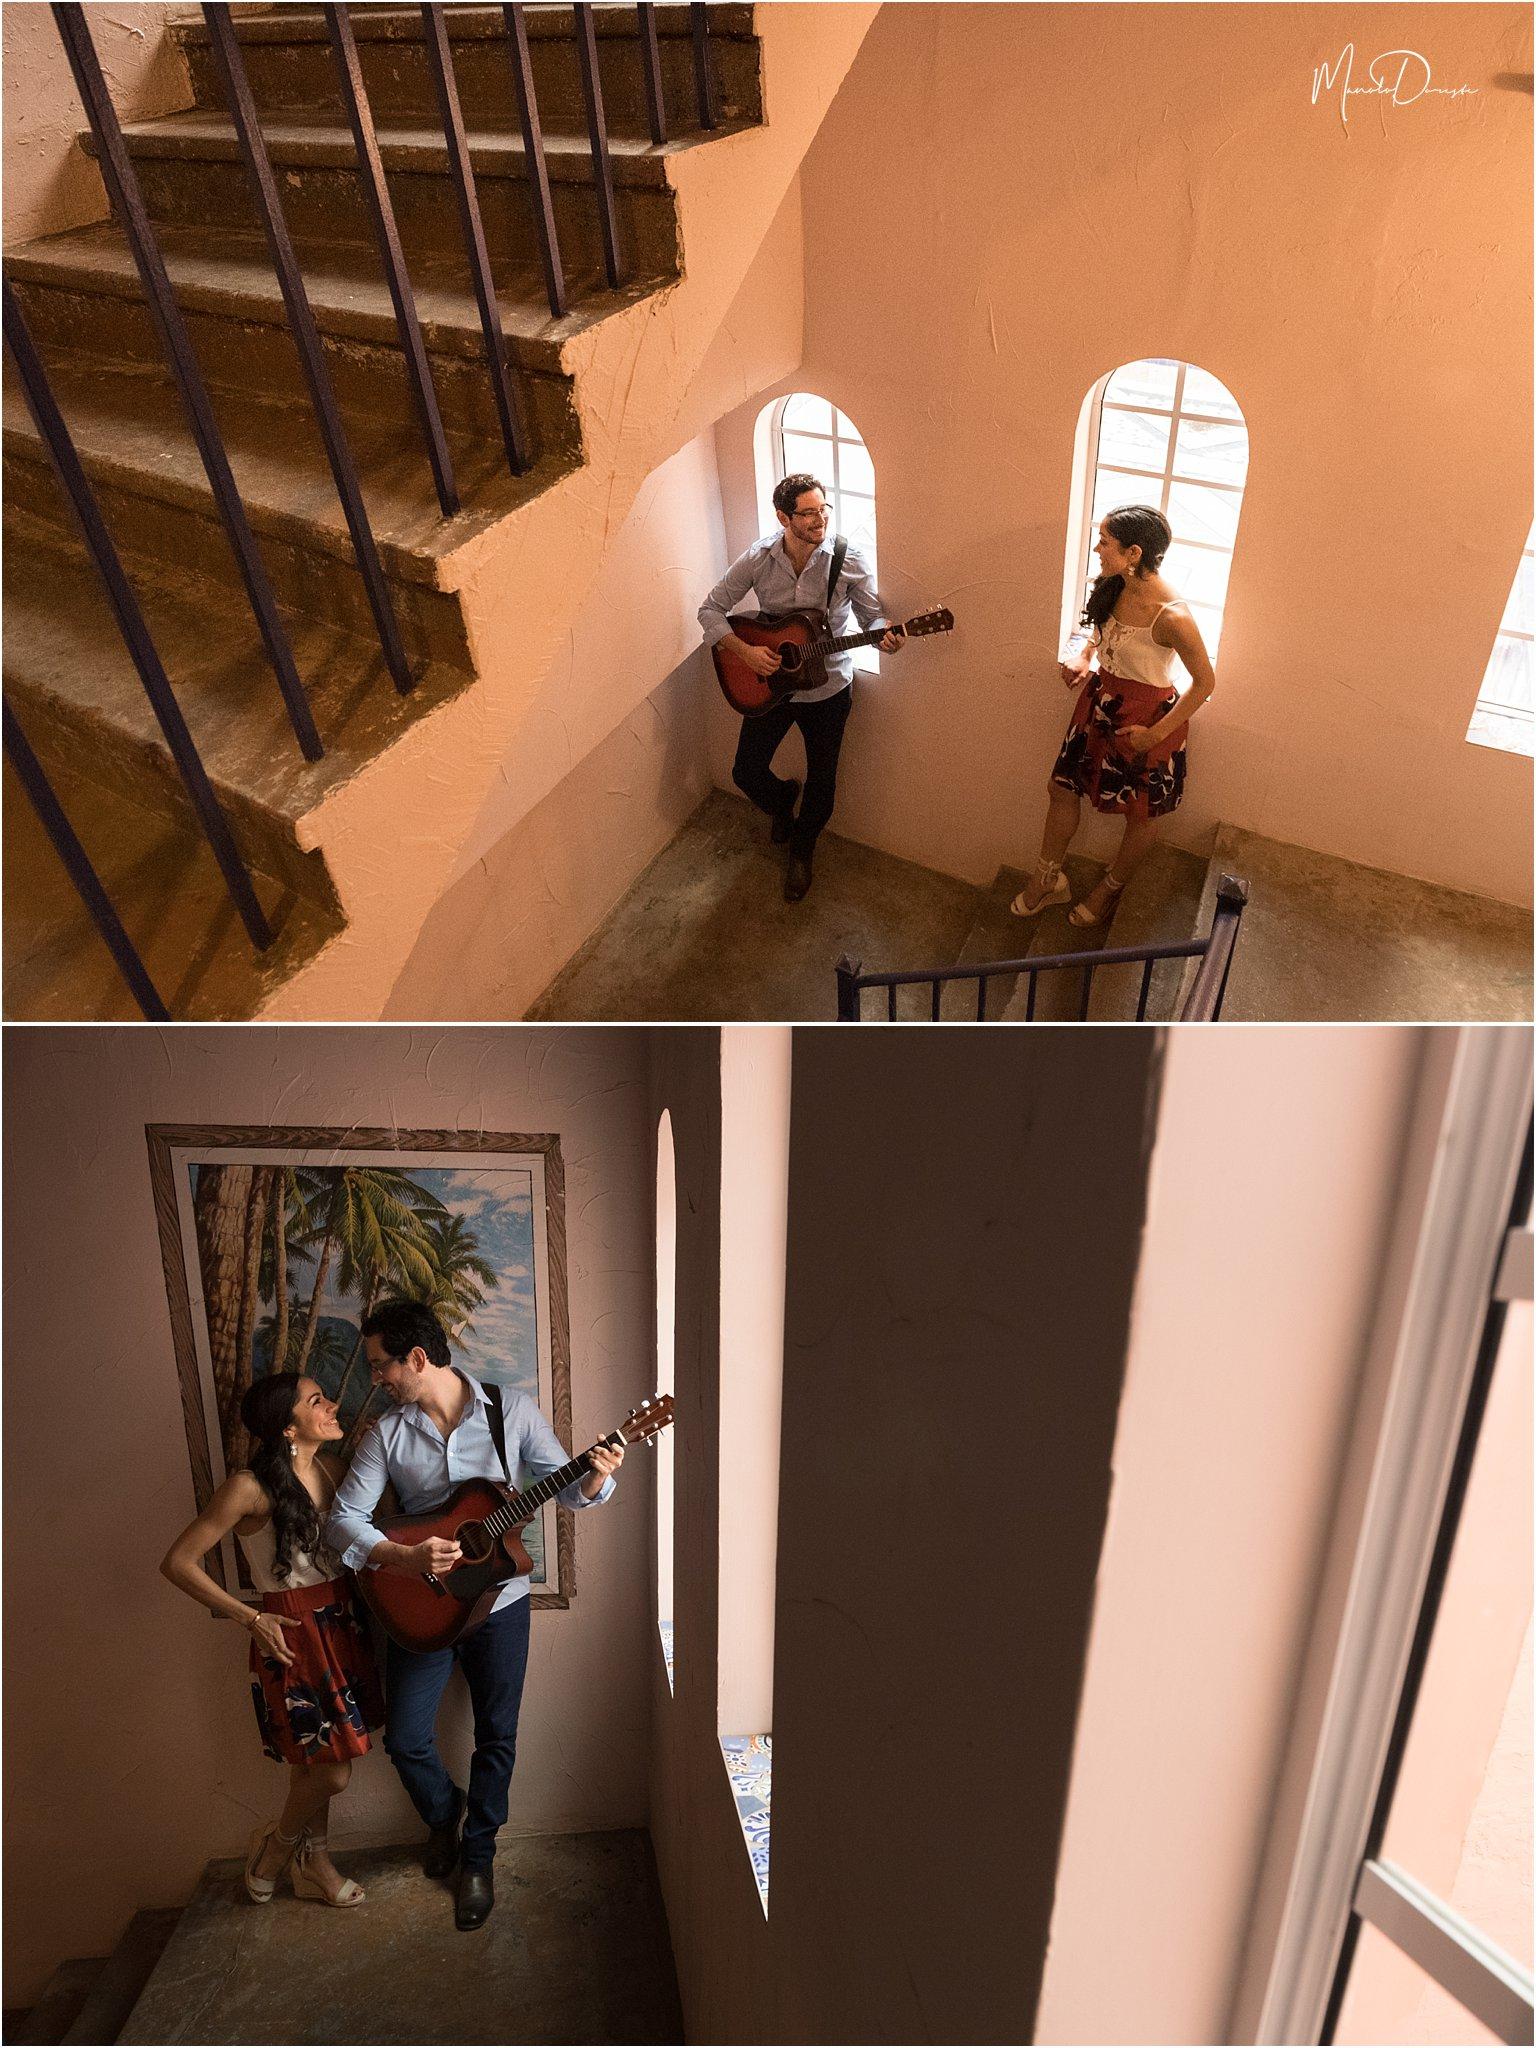 00776_ManoloDoreste_InFocusStudios_Wedding_Family_Photography_Miami_MiamiPhotographer.jpg